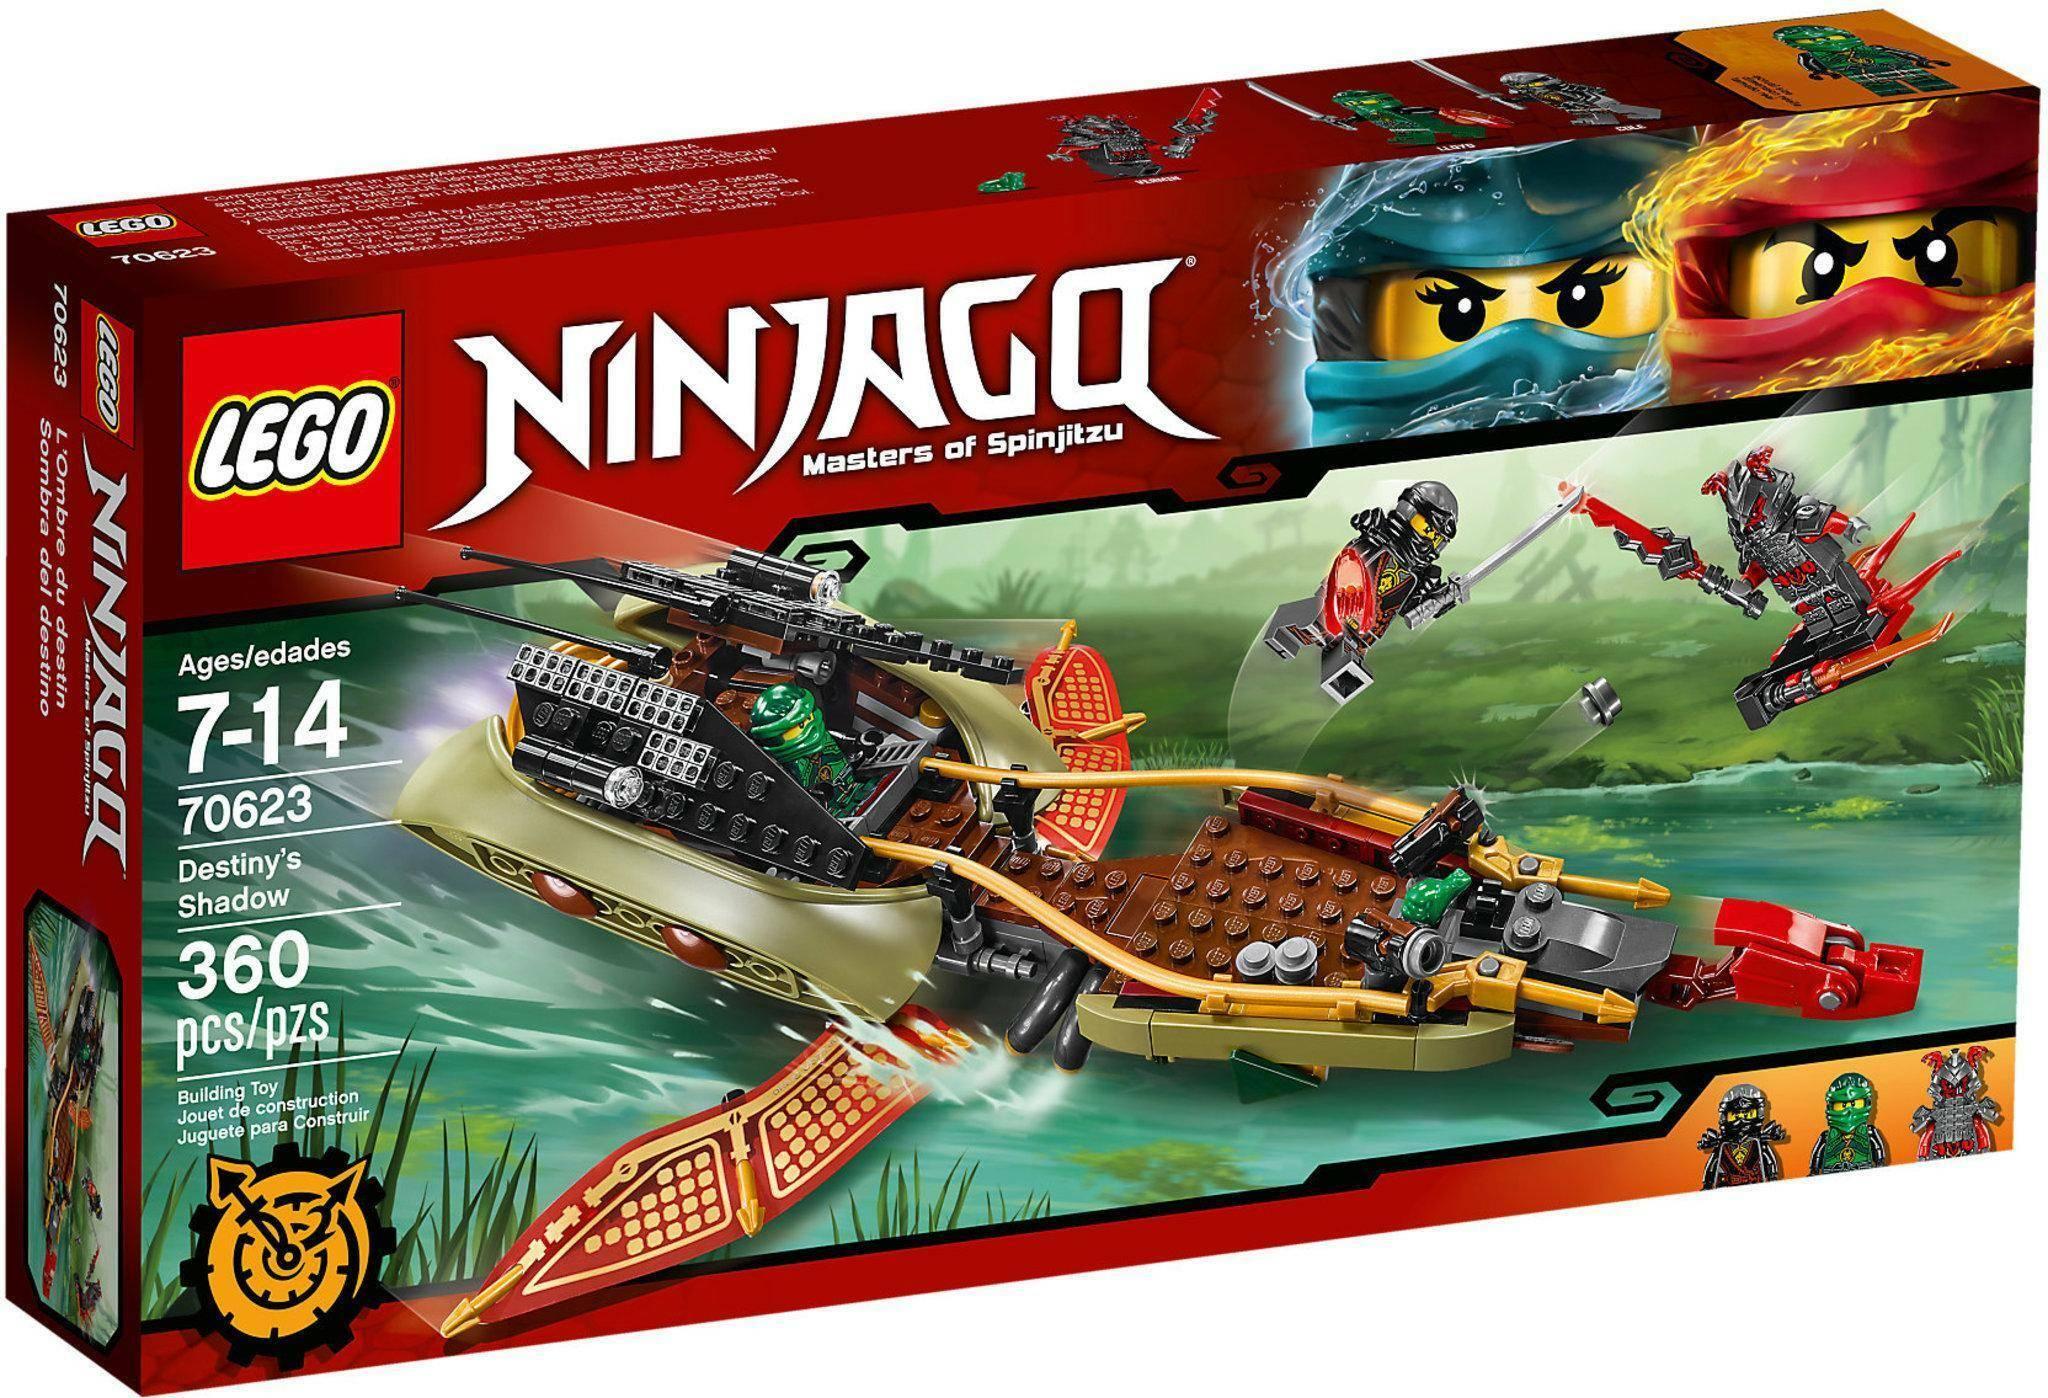 lego ombra del destino lego ninjago 70623